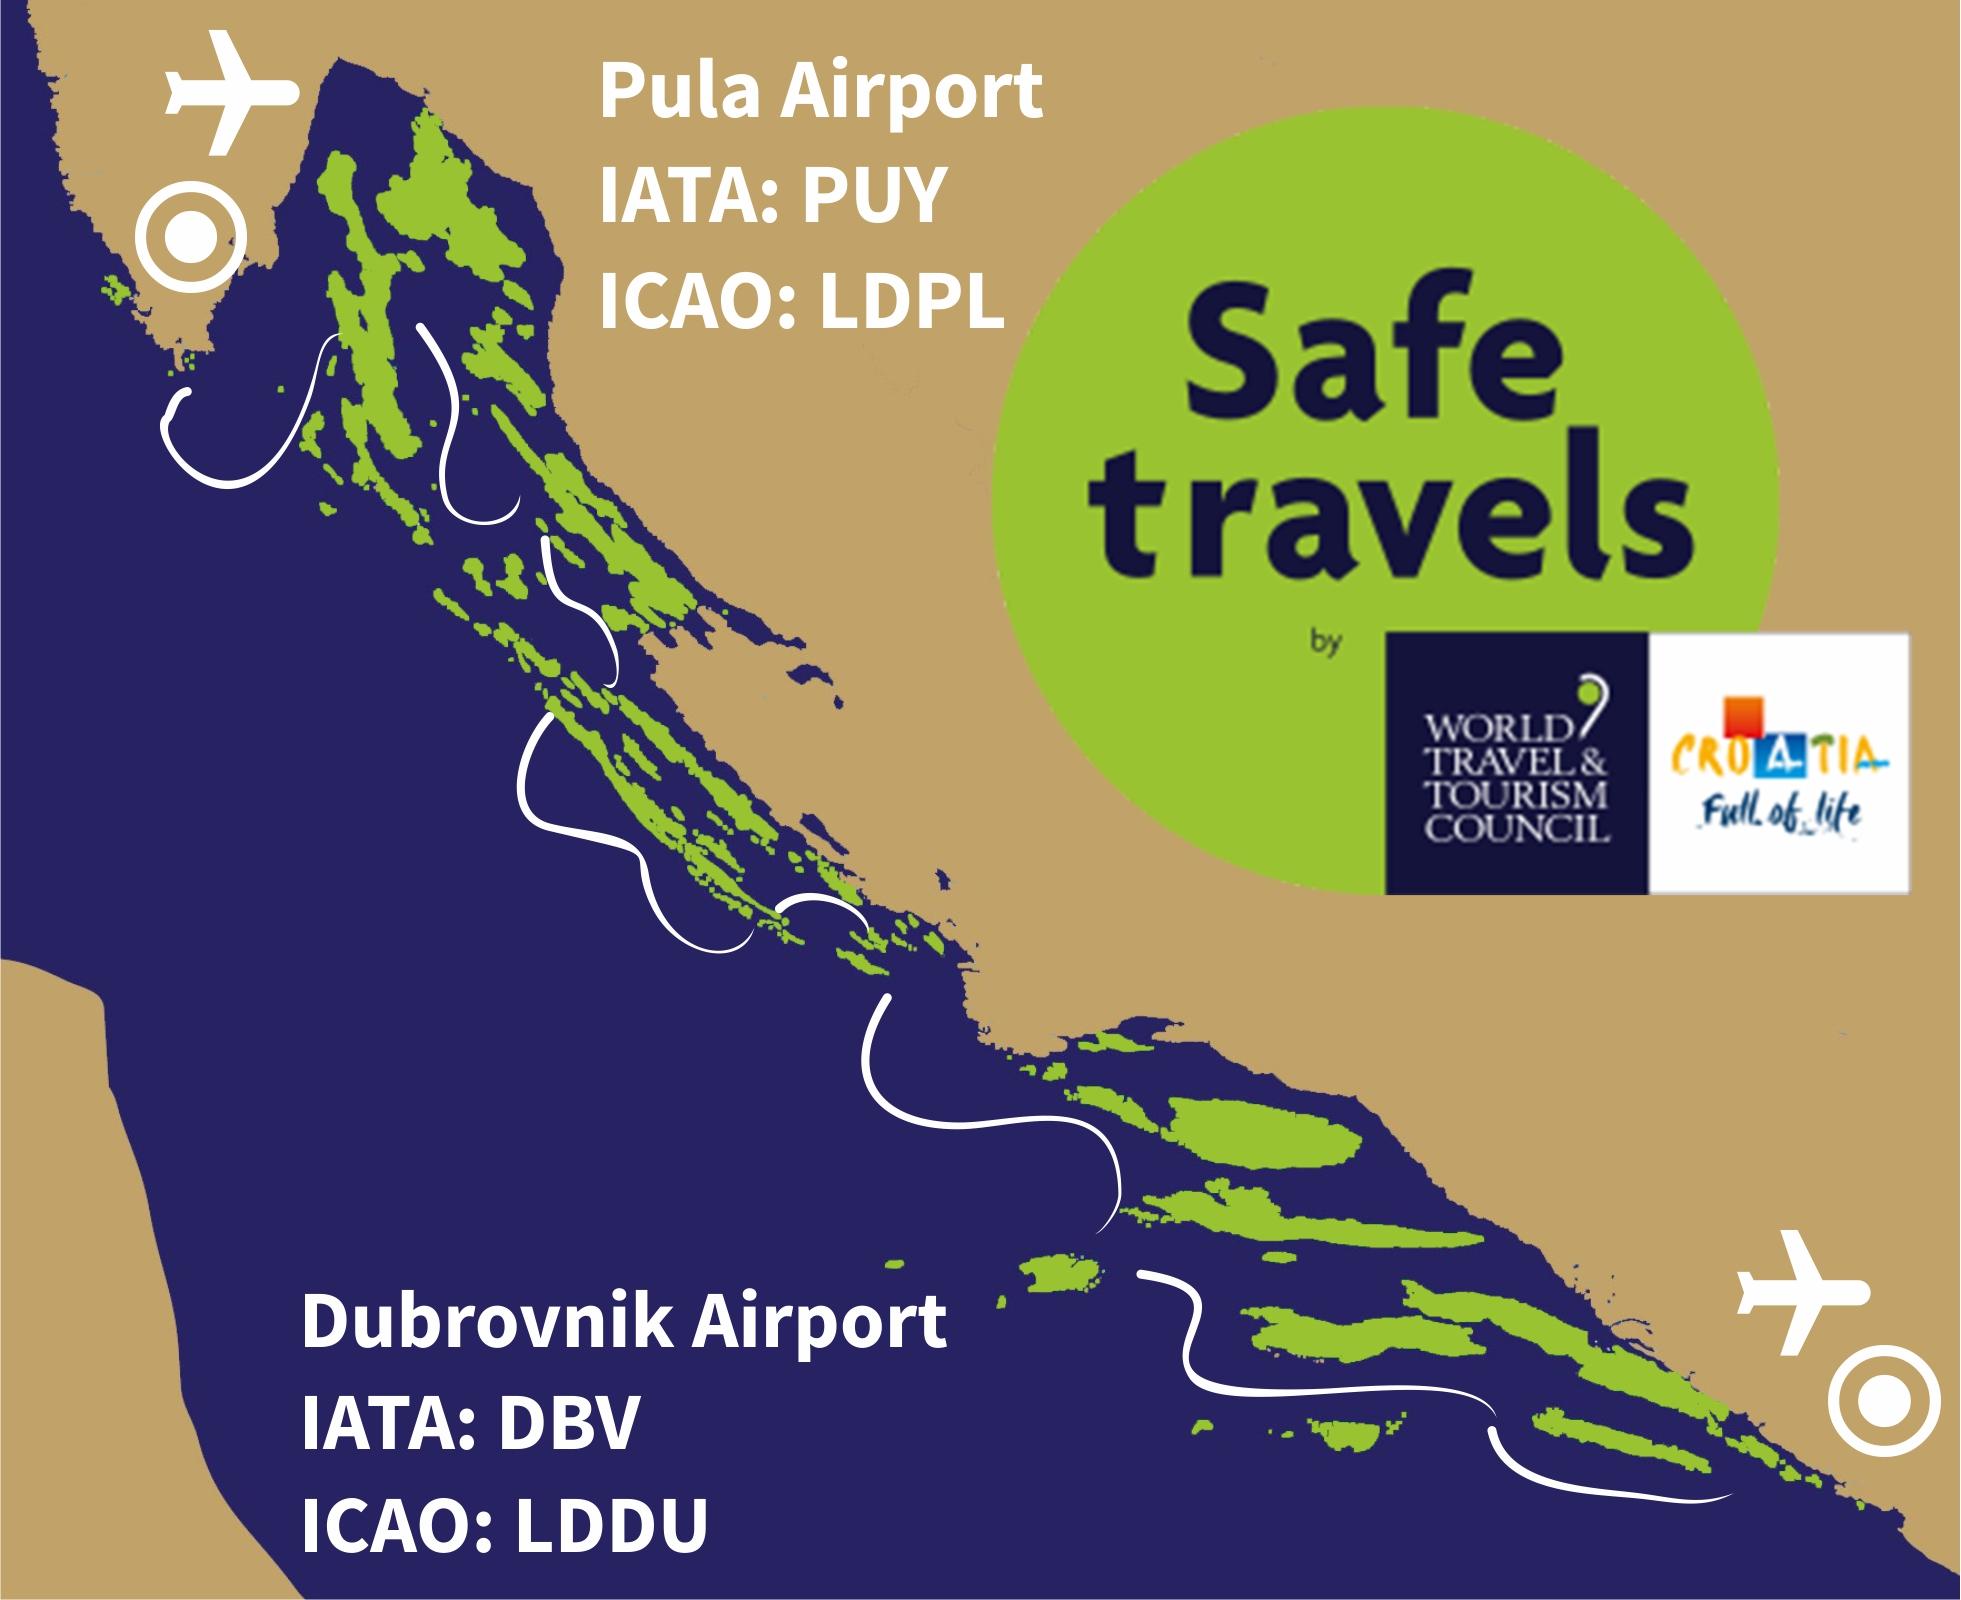 21 days Pula Dubrovnik sailing route SAFE Travels